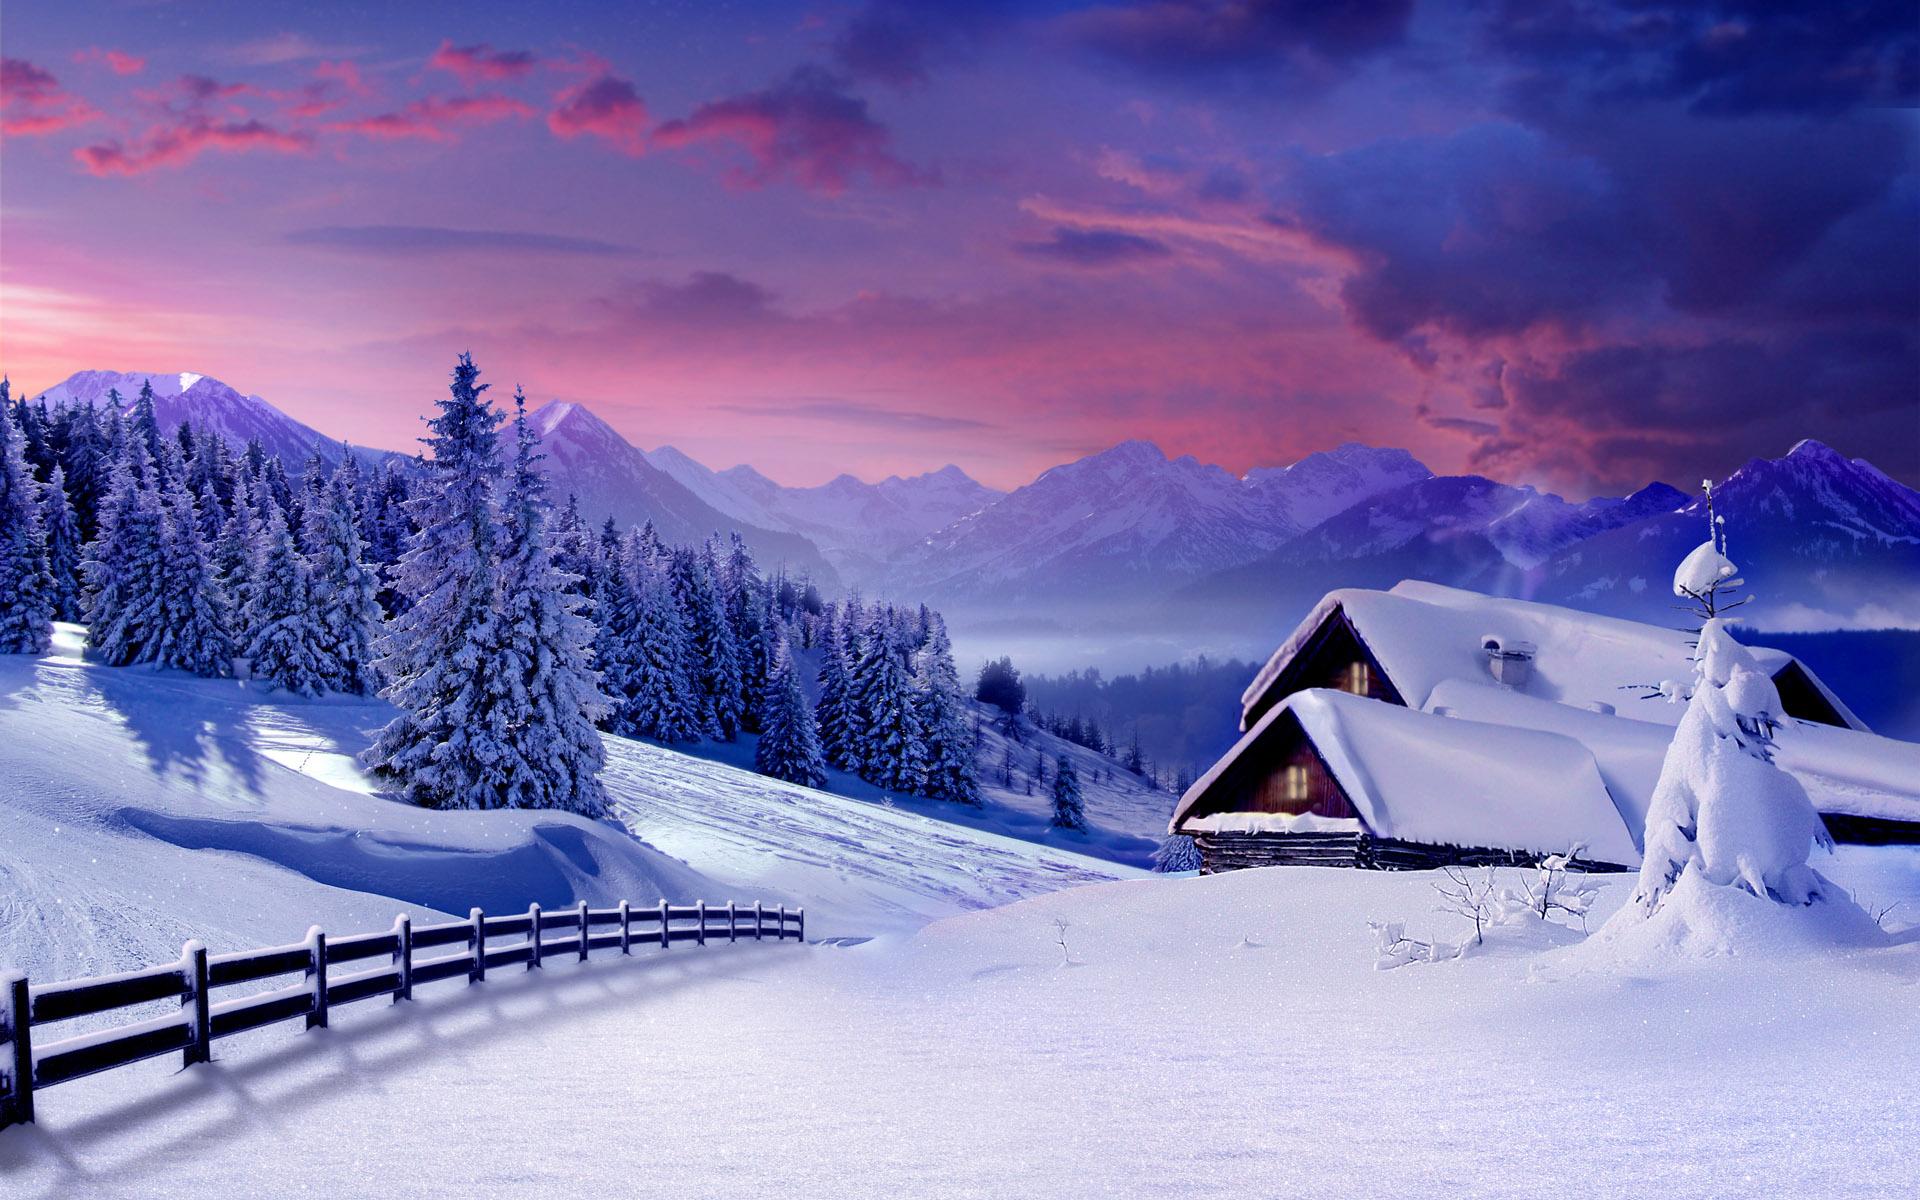 зима большие